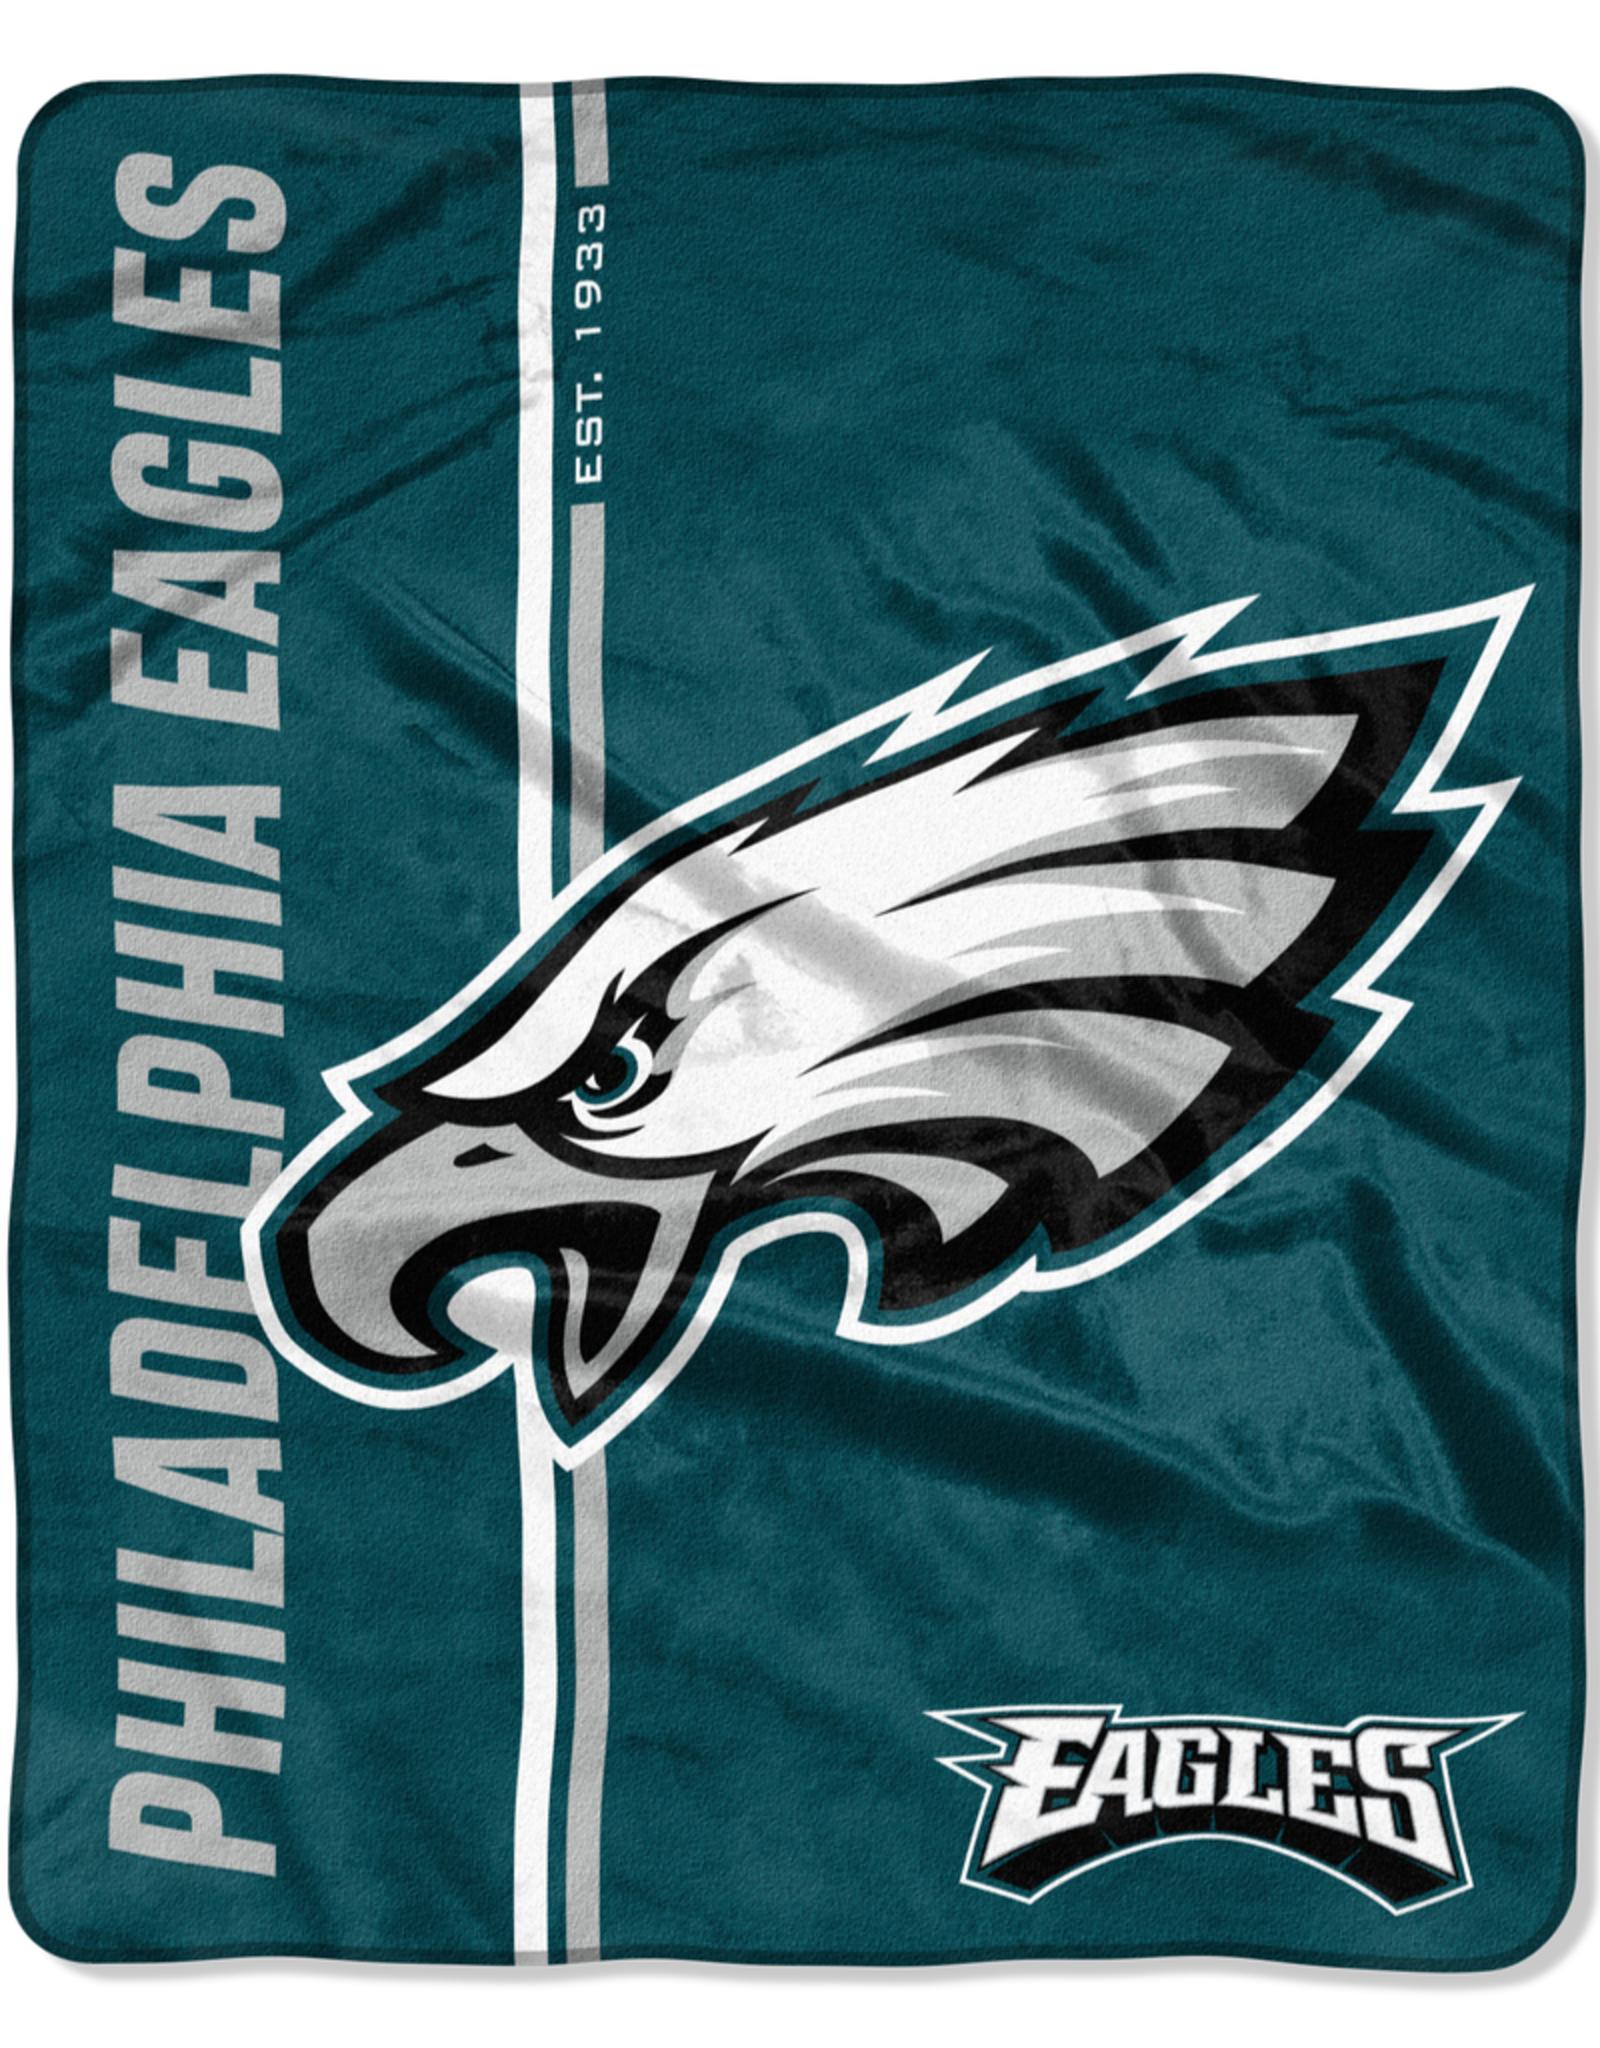 NORTHWEST Philadelphia Eagles Restructure Royal Plush Raschel Throw